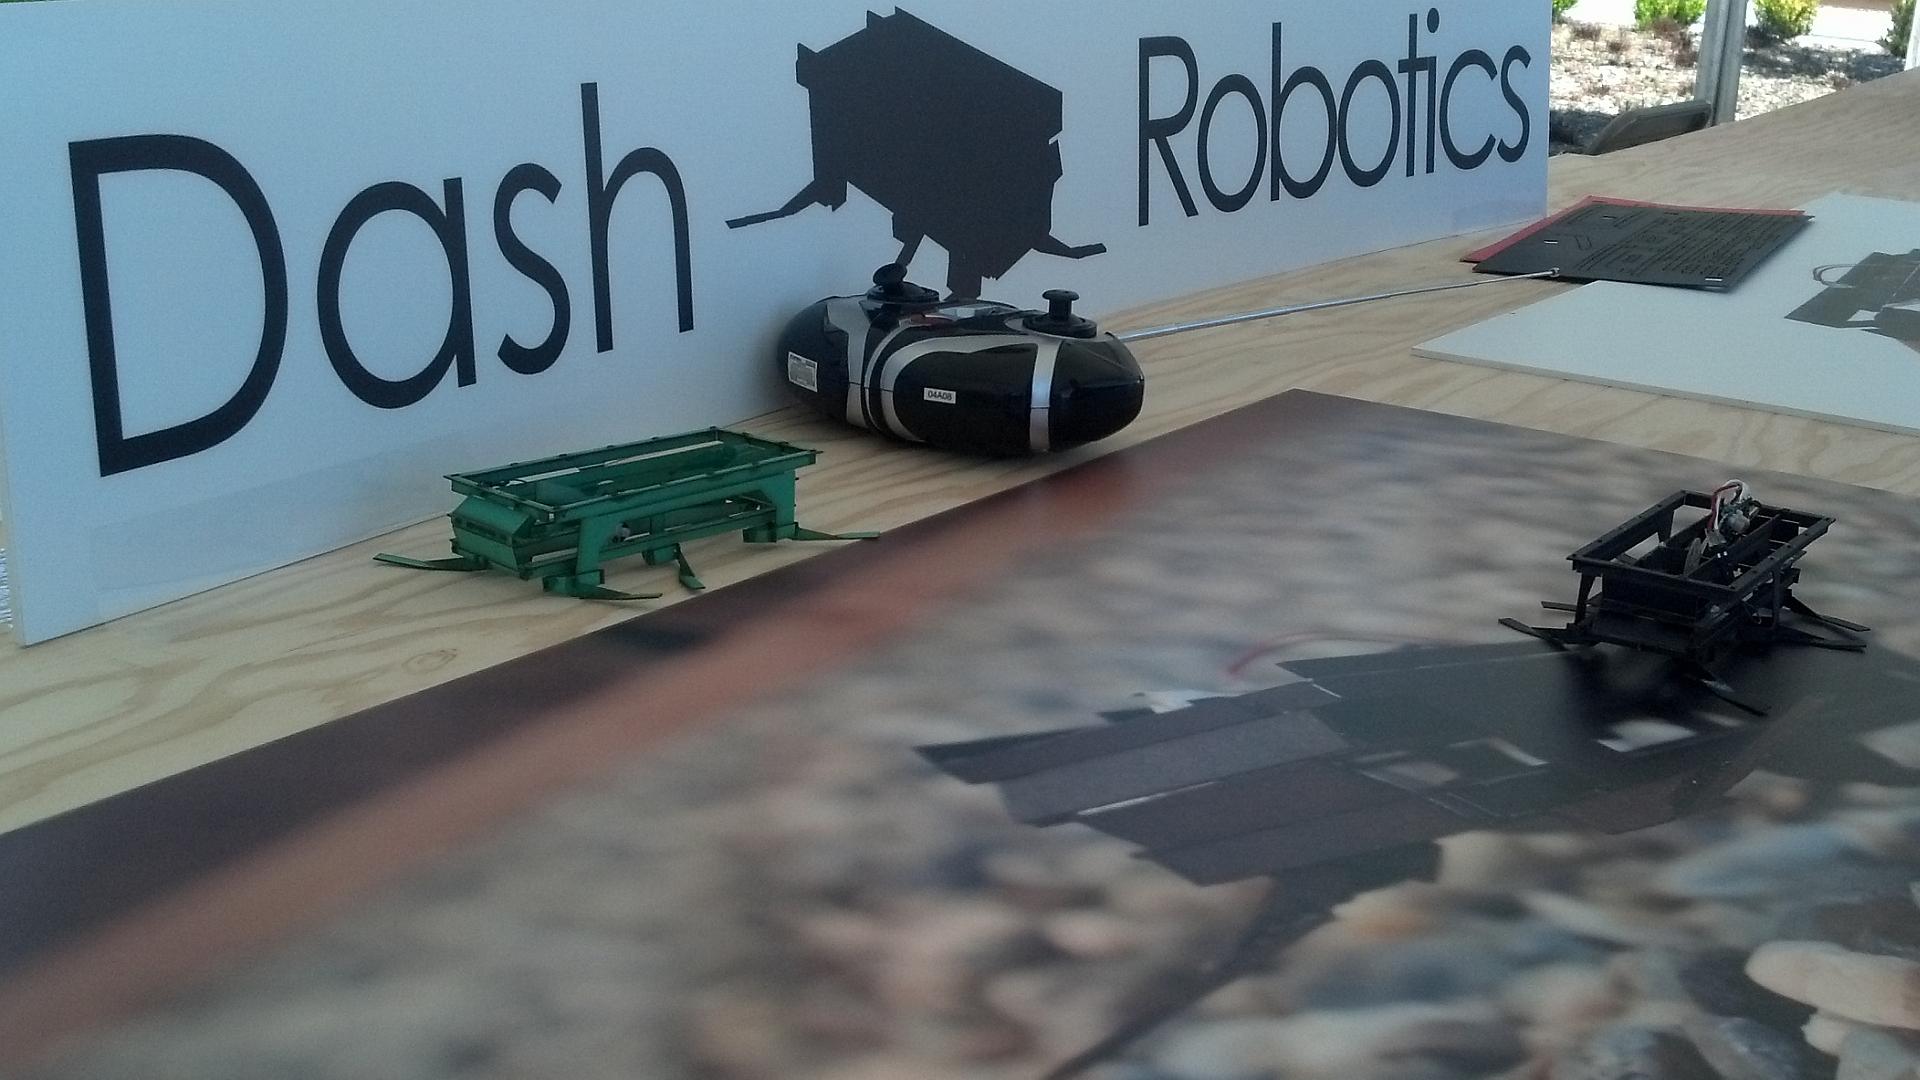 Dash Robotics at the Hardware Innovation Workshop.Photo: Andrew Terranova